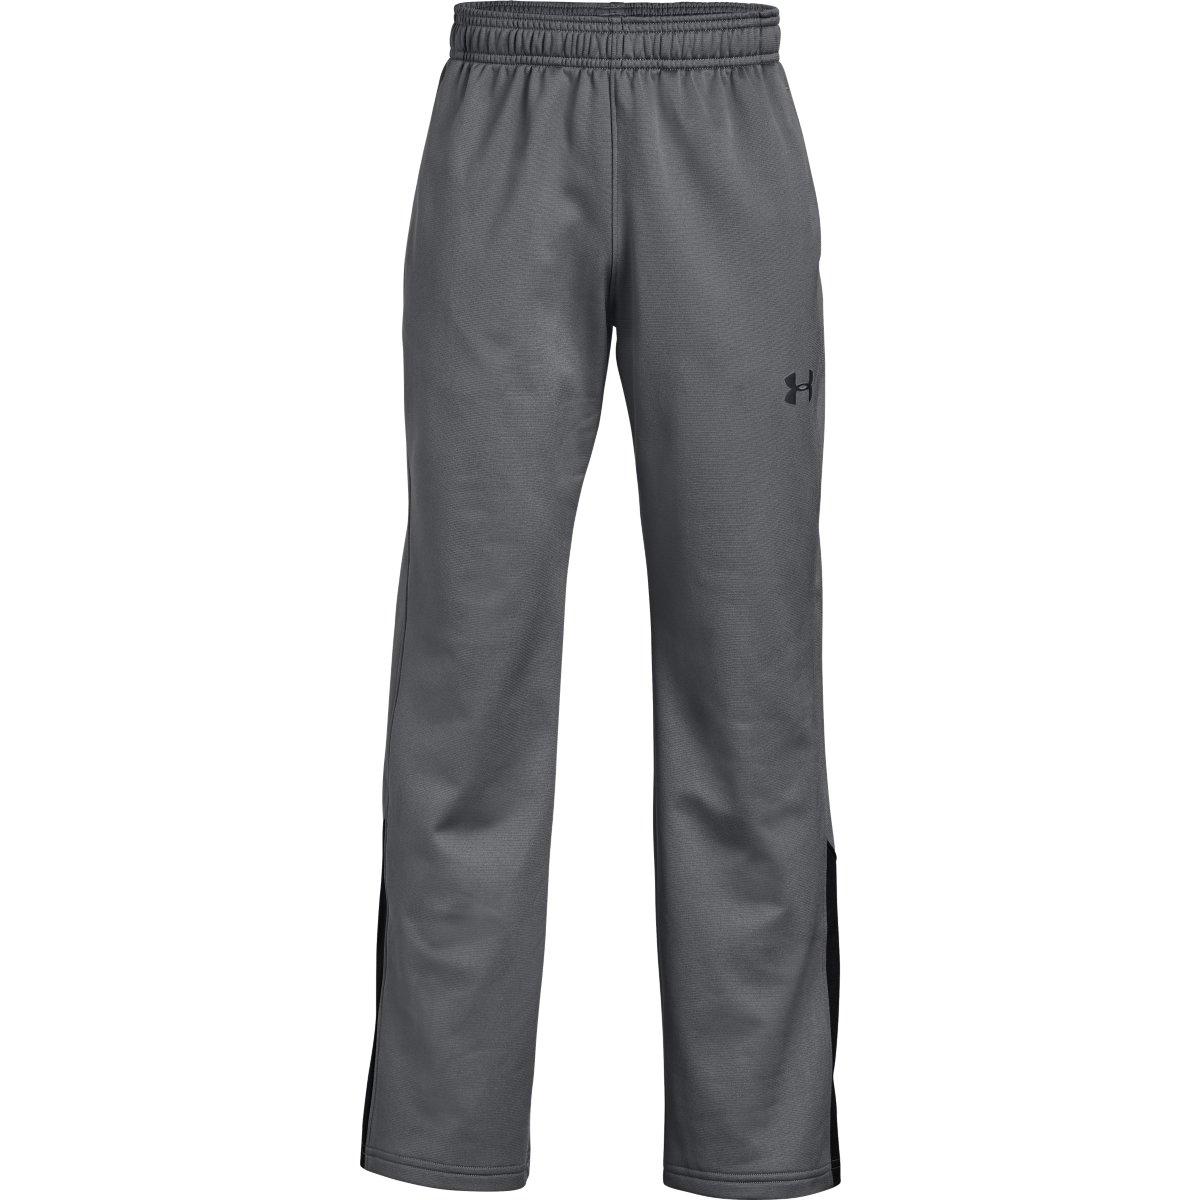 Under Armour Big Boys' Ua Brawler 2.0 Pants - Black, S